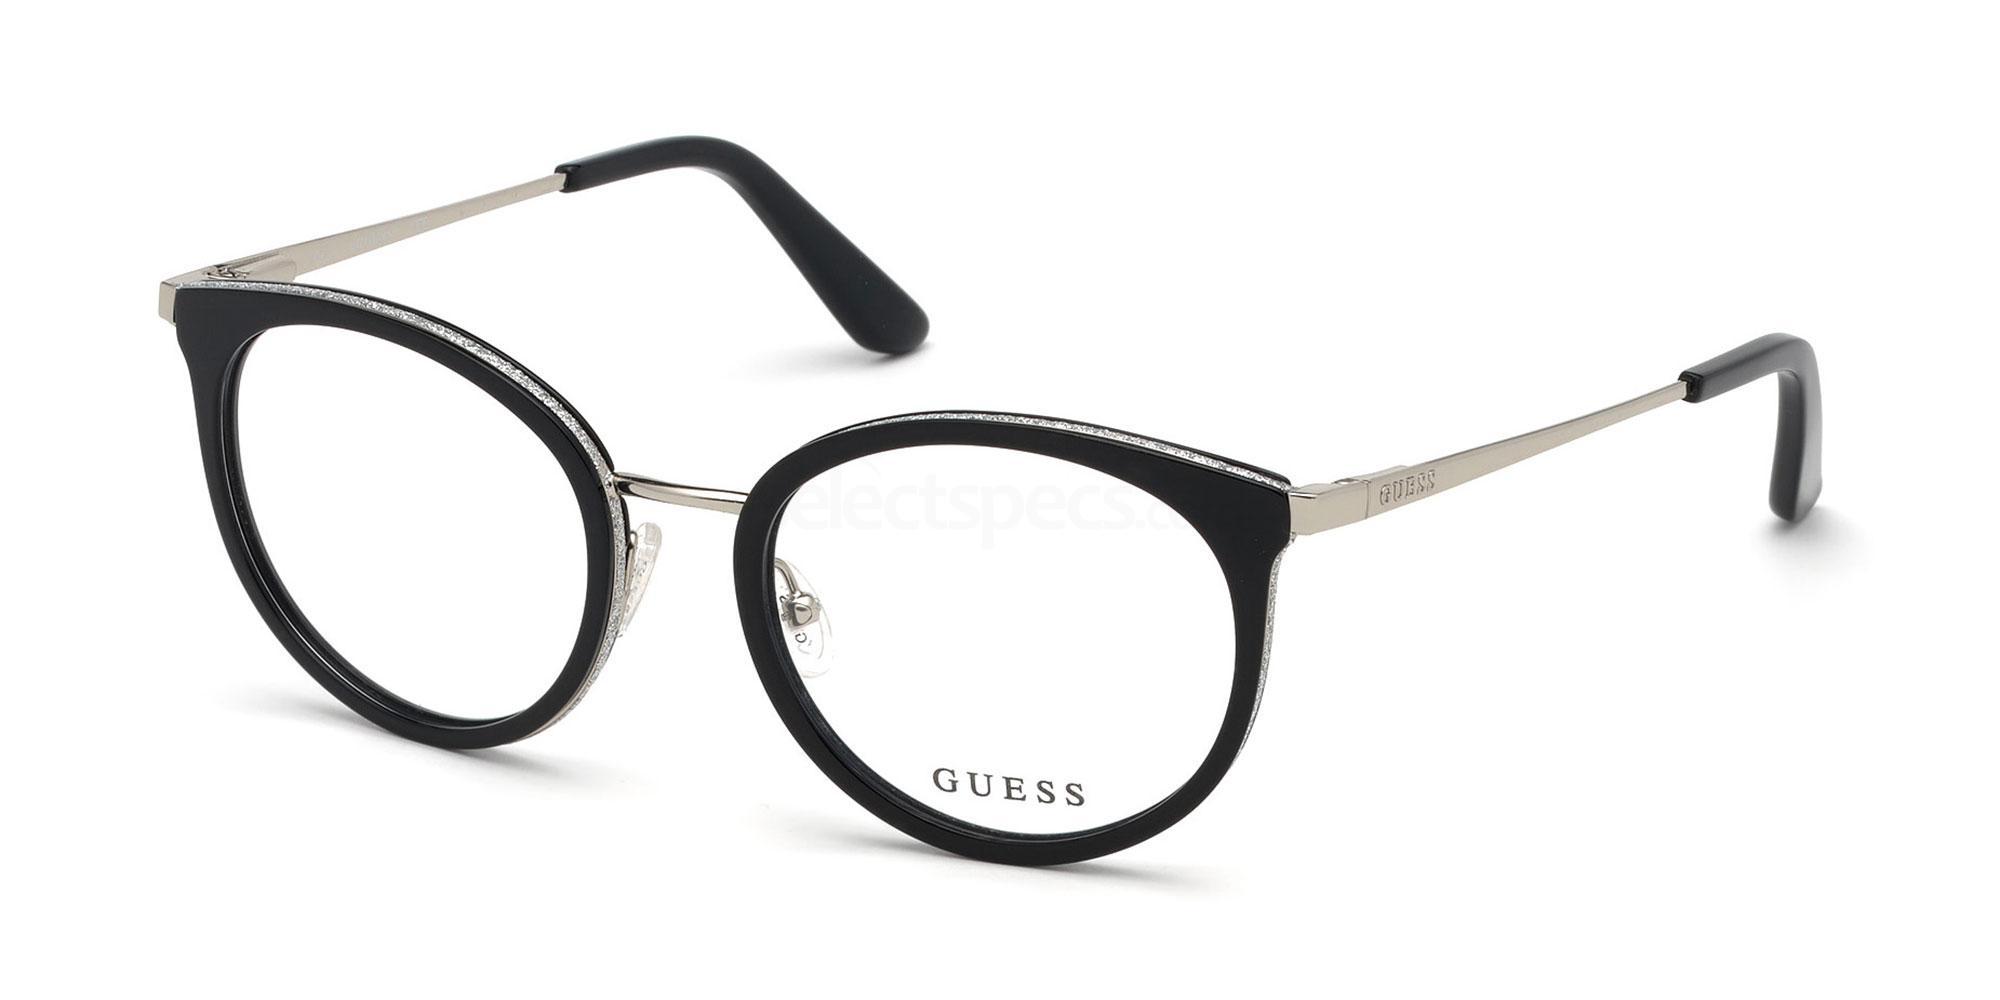 001 GU2707 Glasses, Guess